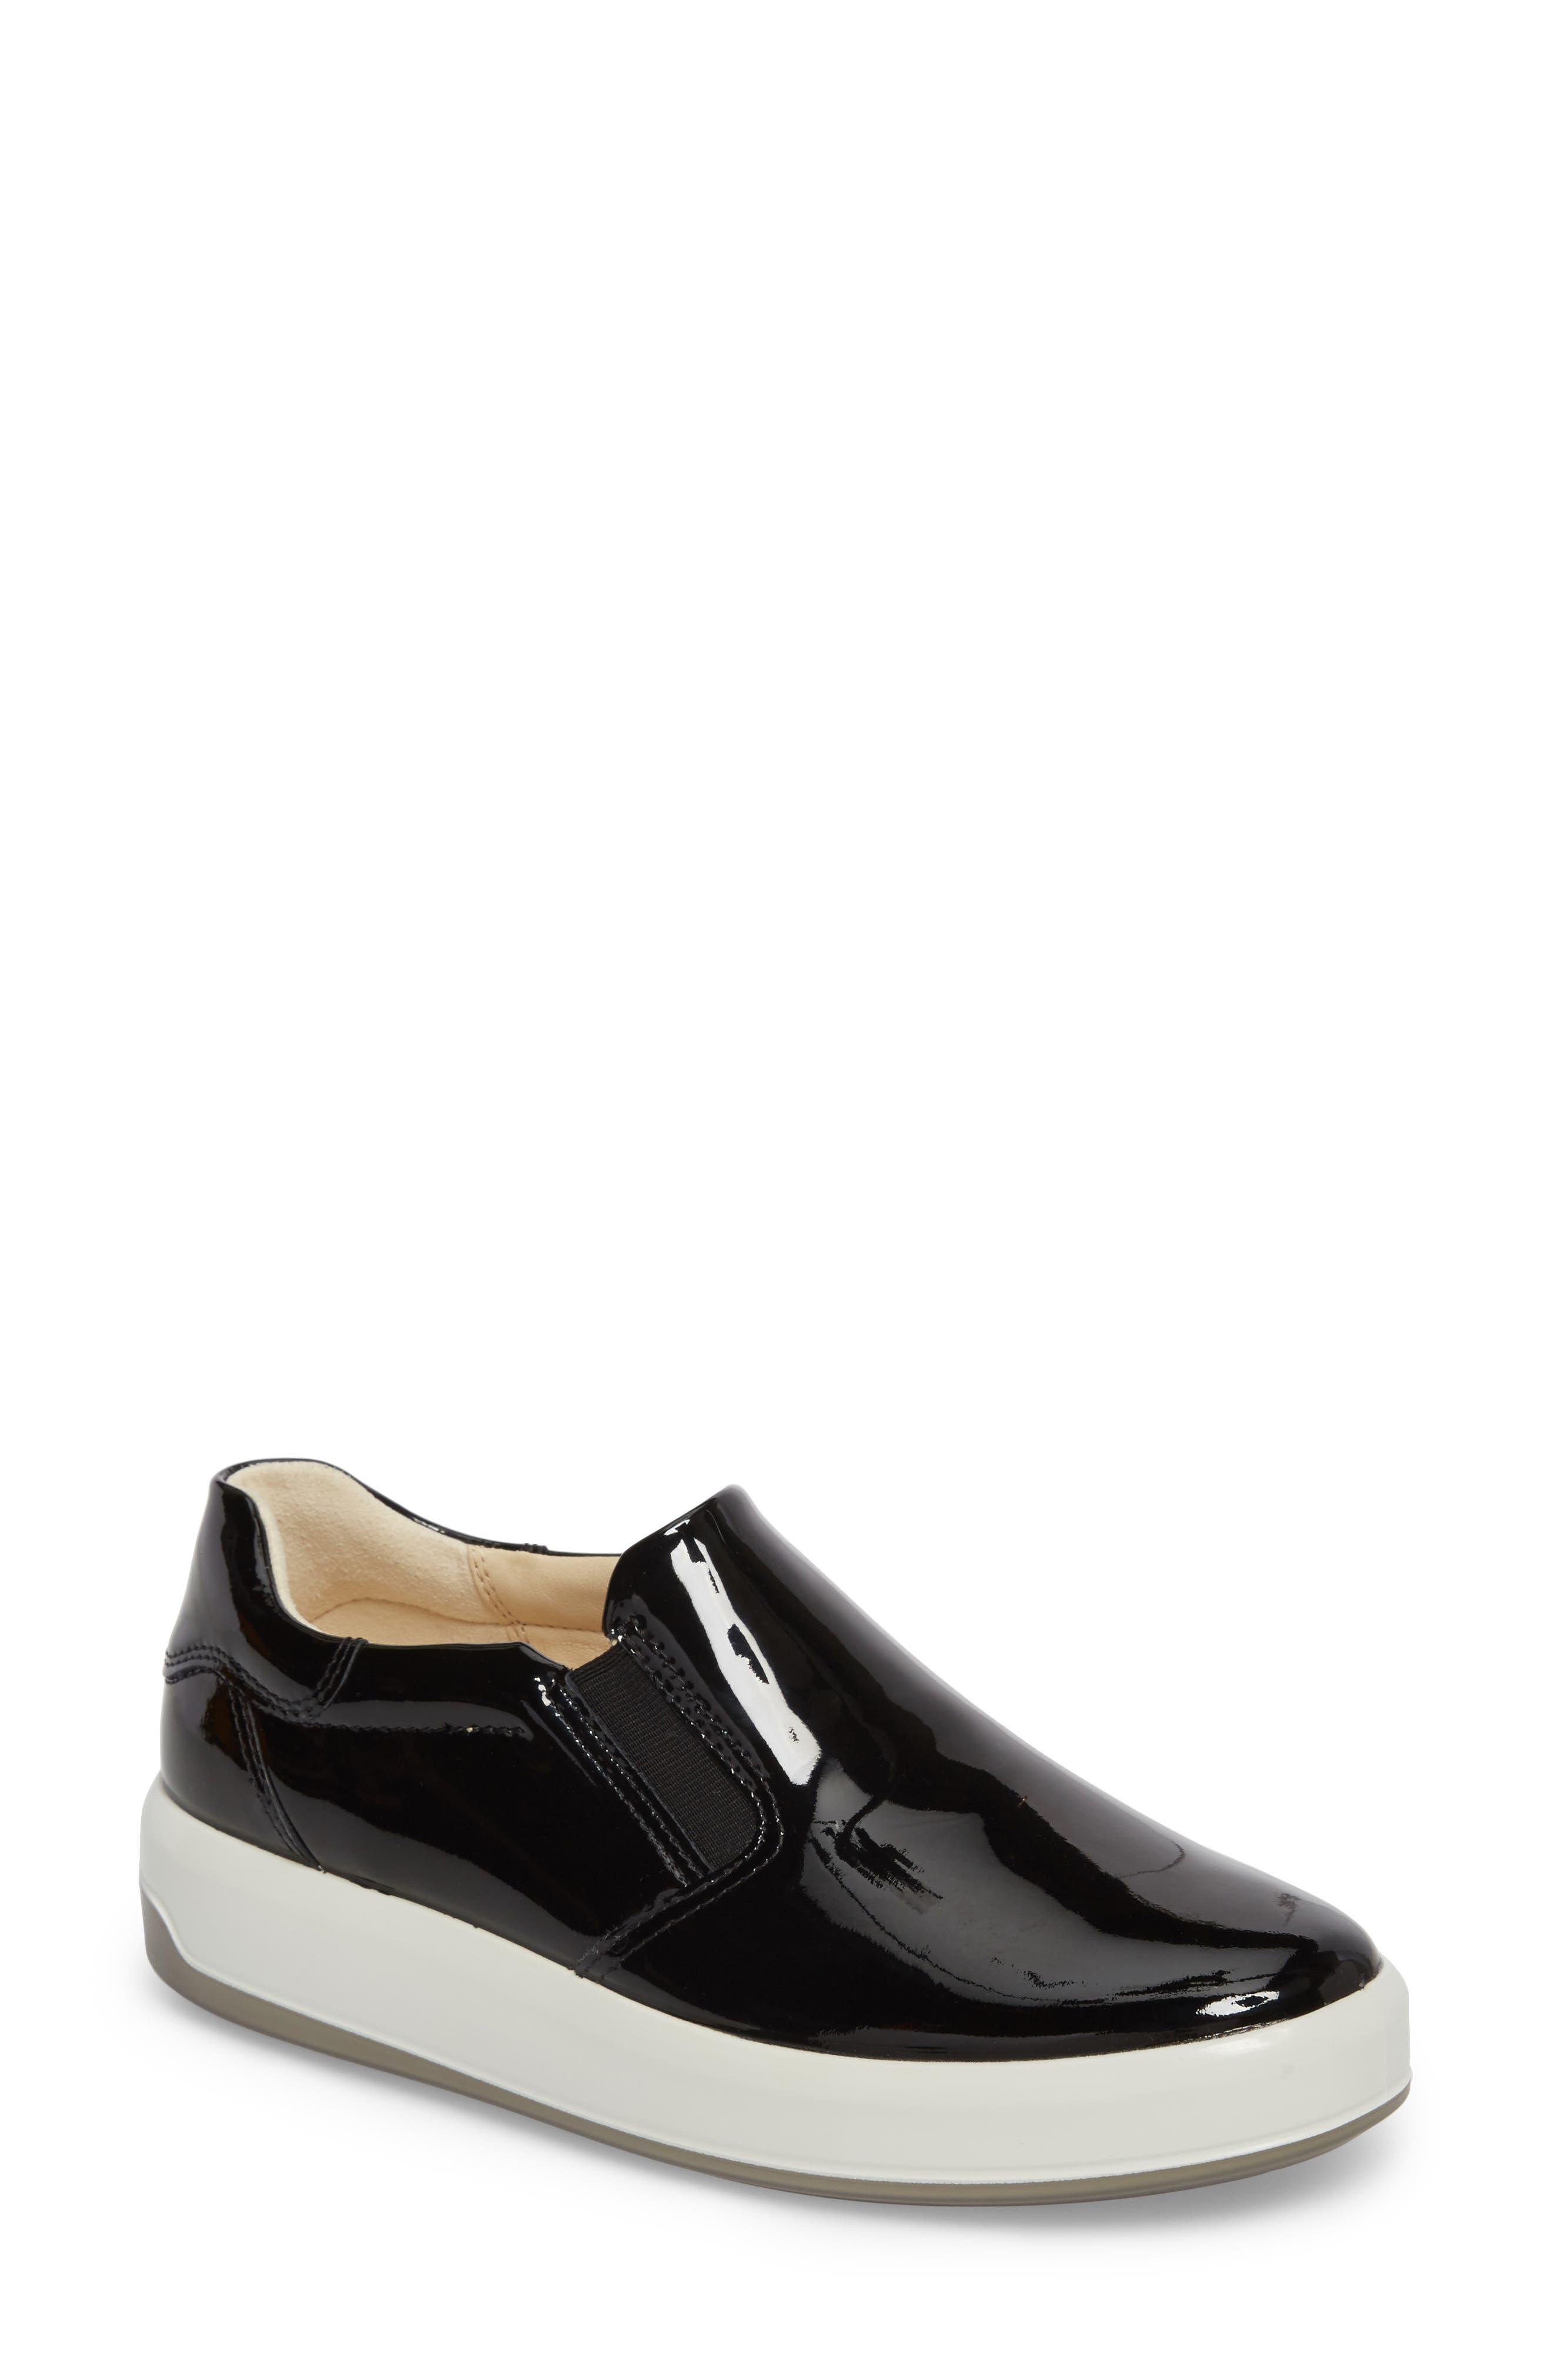 Soft 9 Slip-On Sneaker,                             Main thumbnail 1, color,                             Black Patent Leather